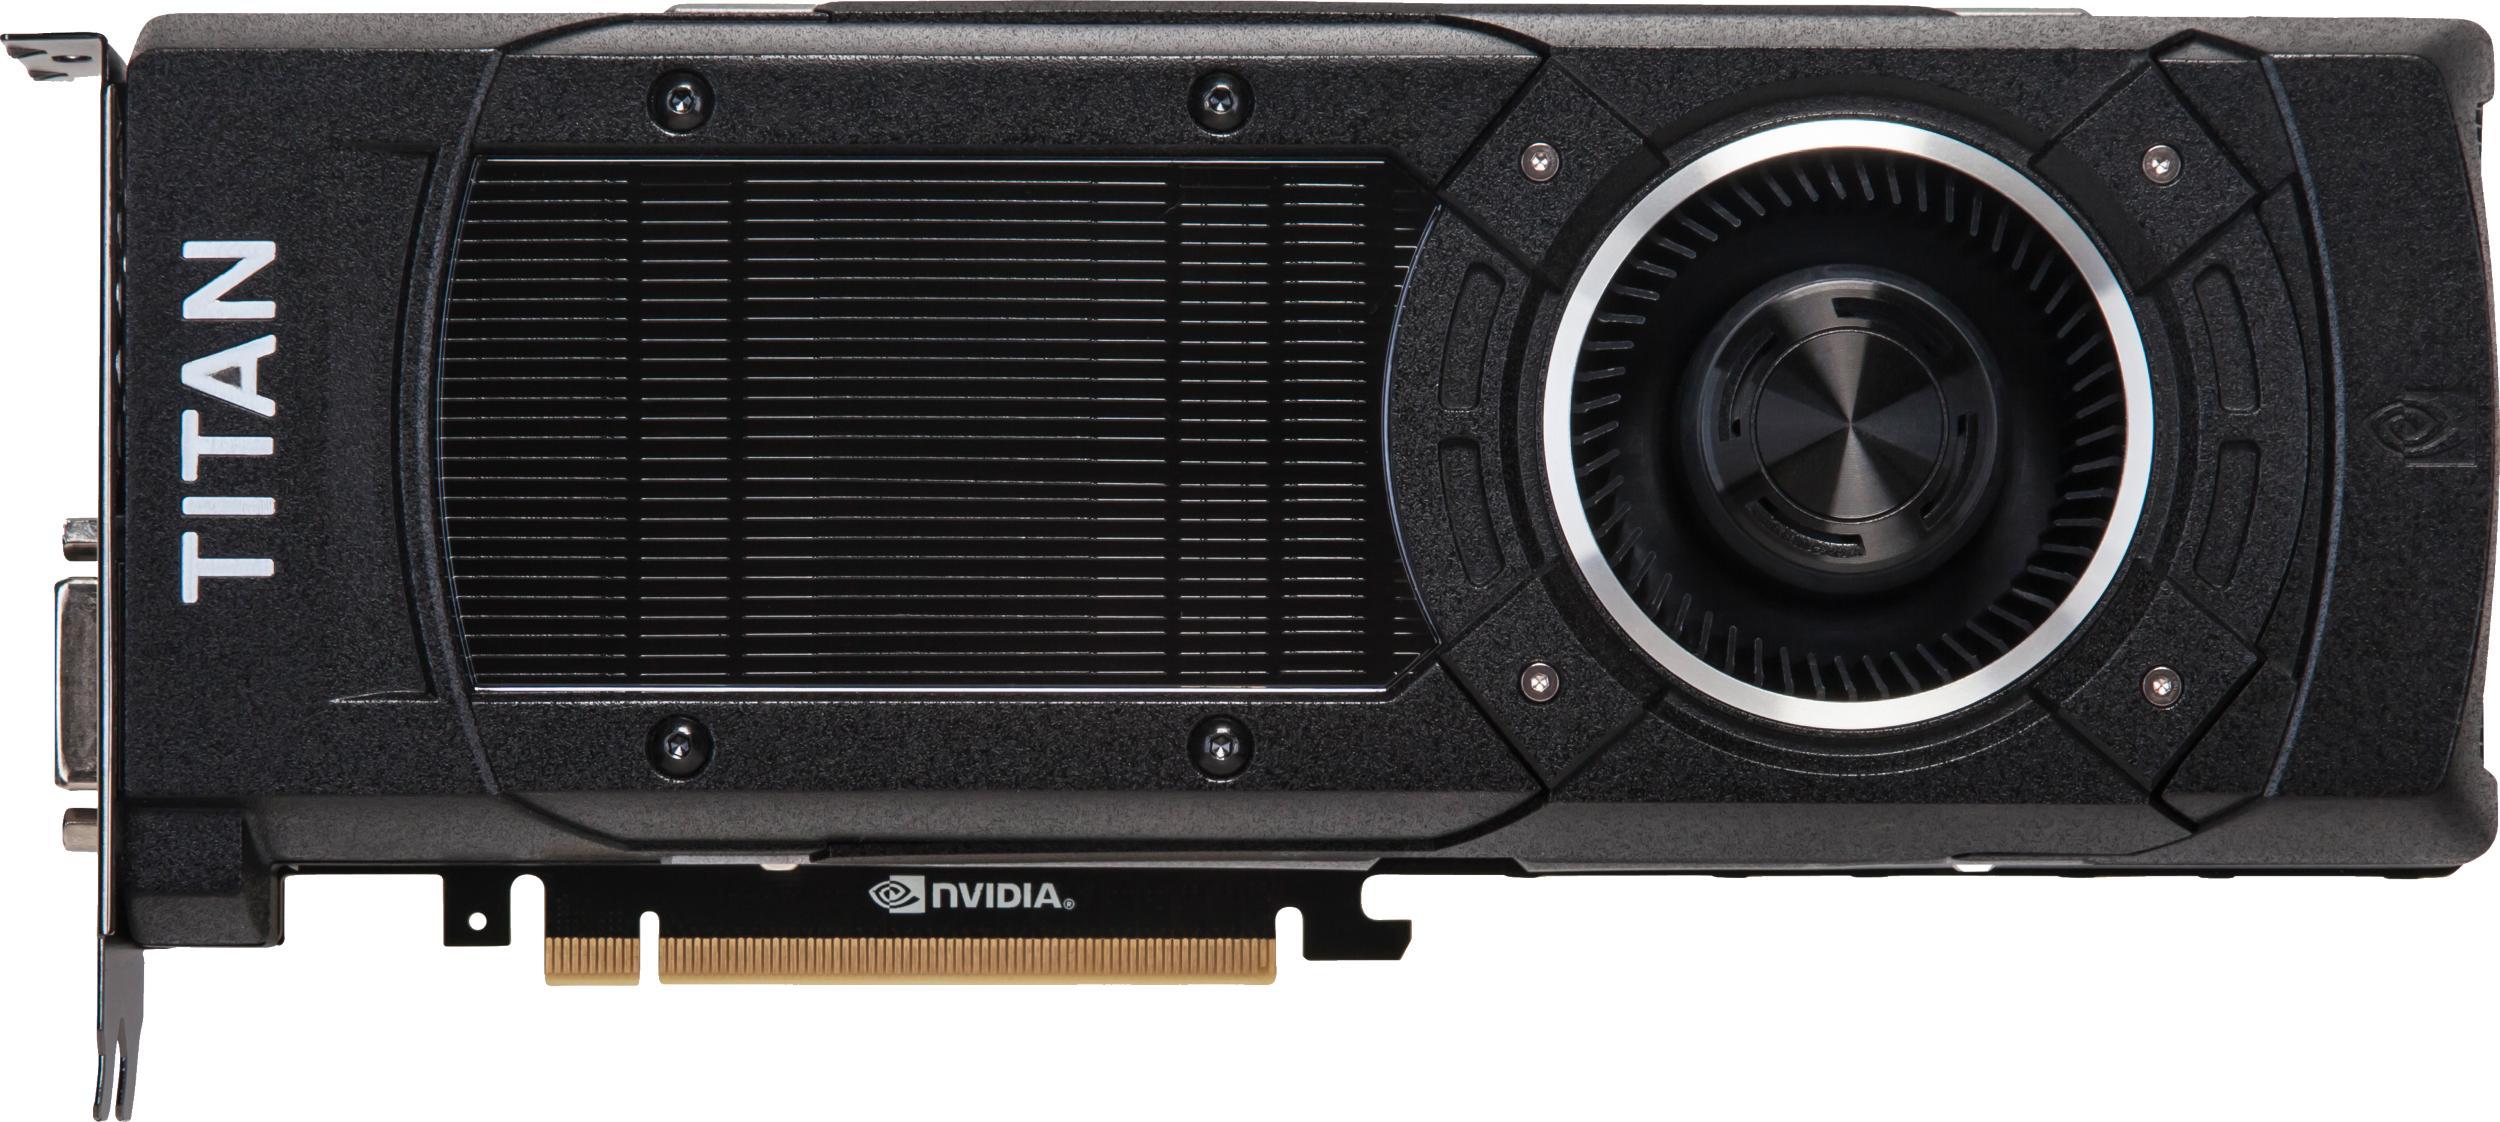 Palit GeForce GTX Titan X